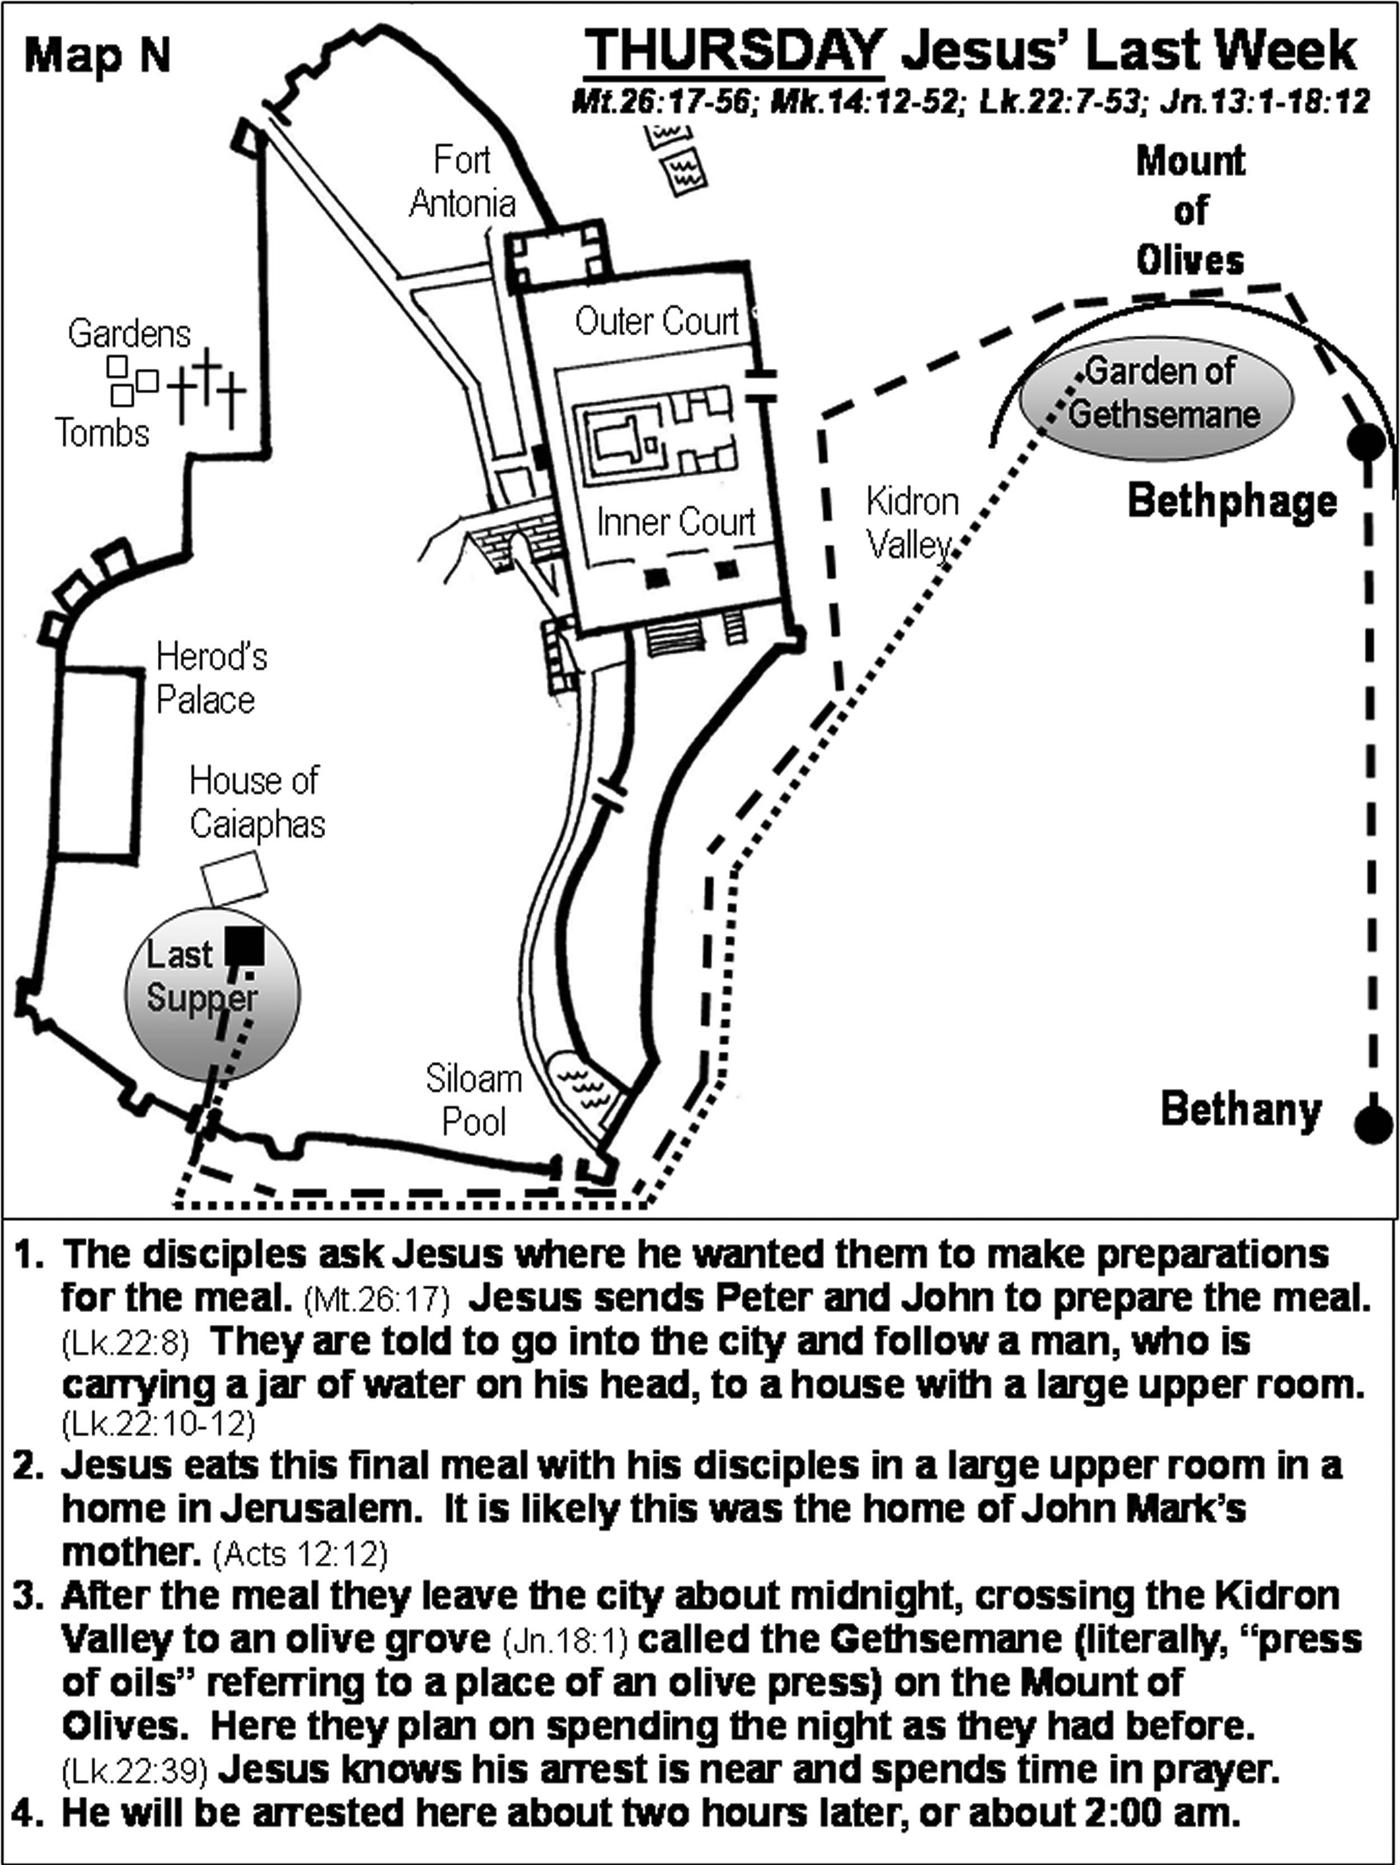 details of thursday of jesus last week